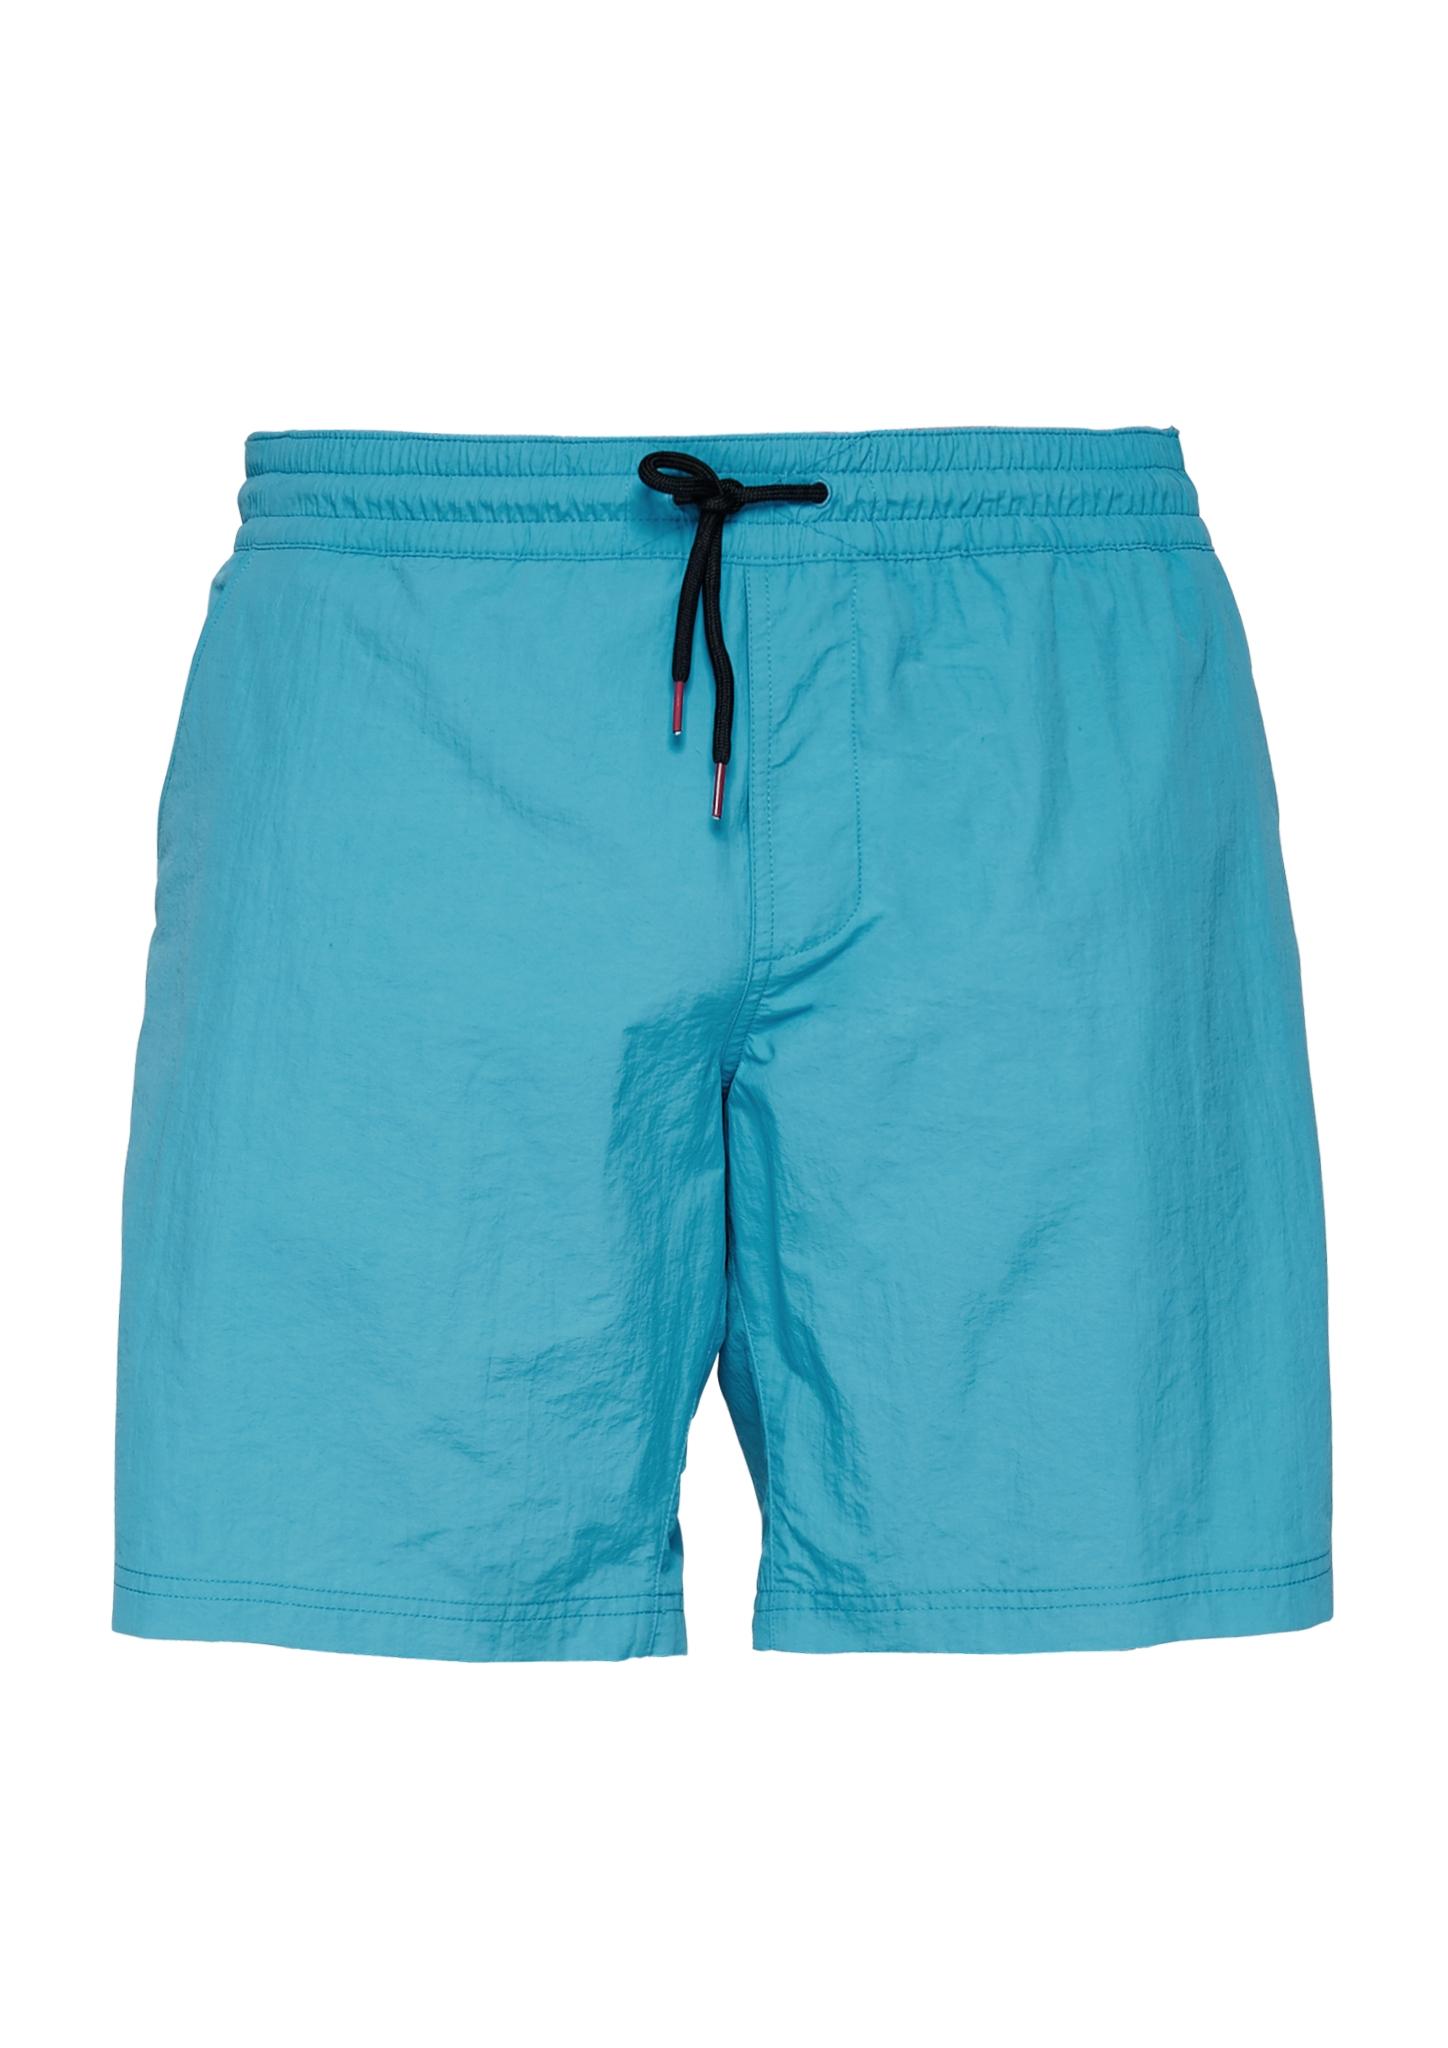 Badeshorts   Bekleidung > Bademode   Türkis   Obermaterial 100% polyamid  futter 100% polyester   s.Oliver Men Big Sizes